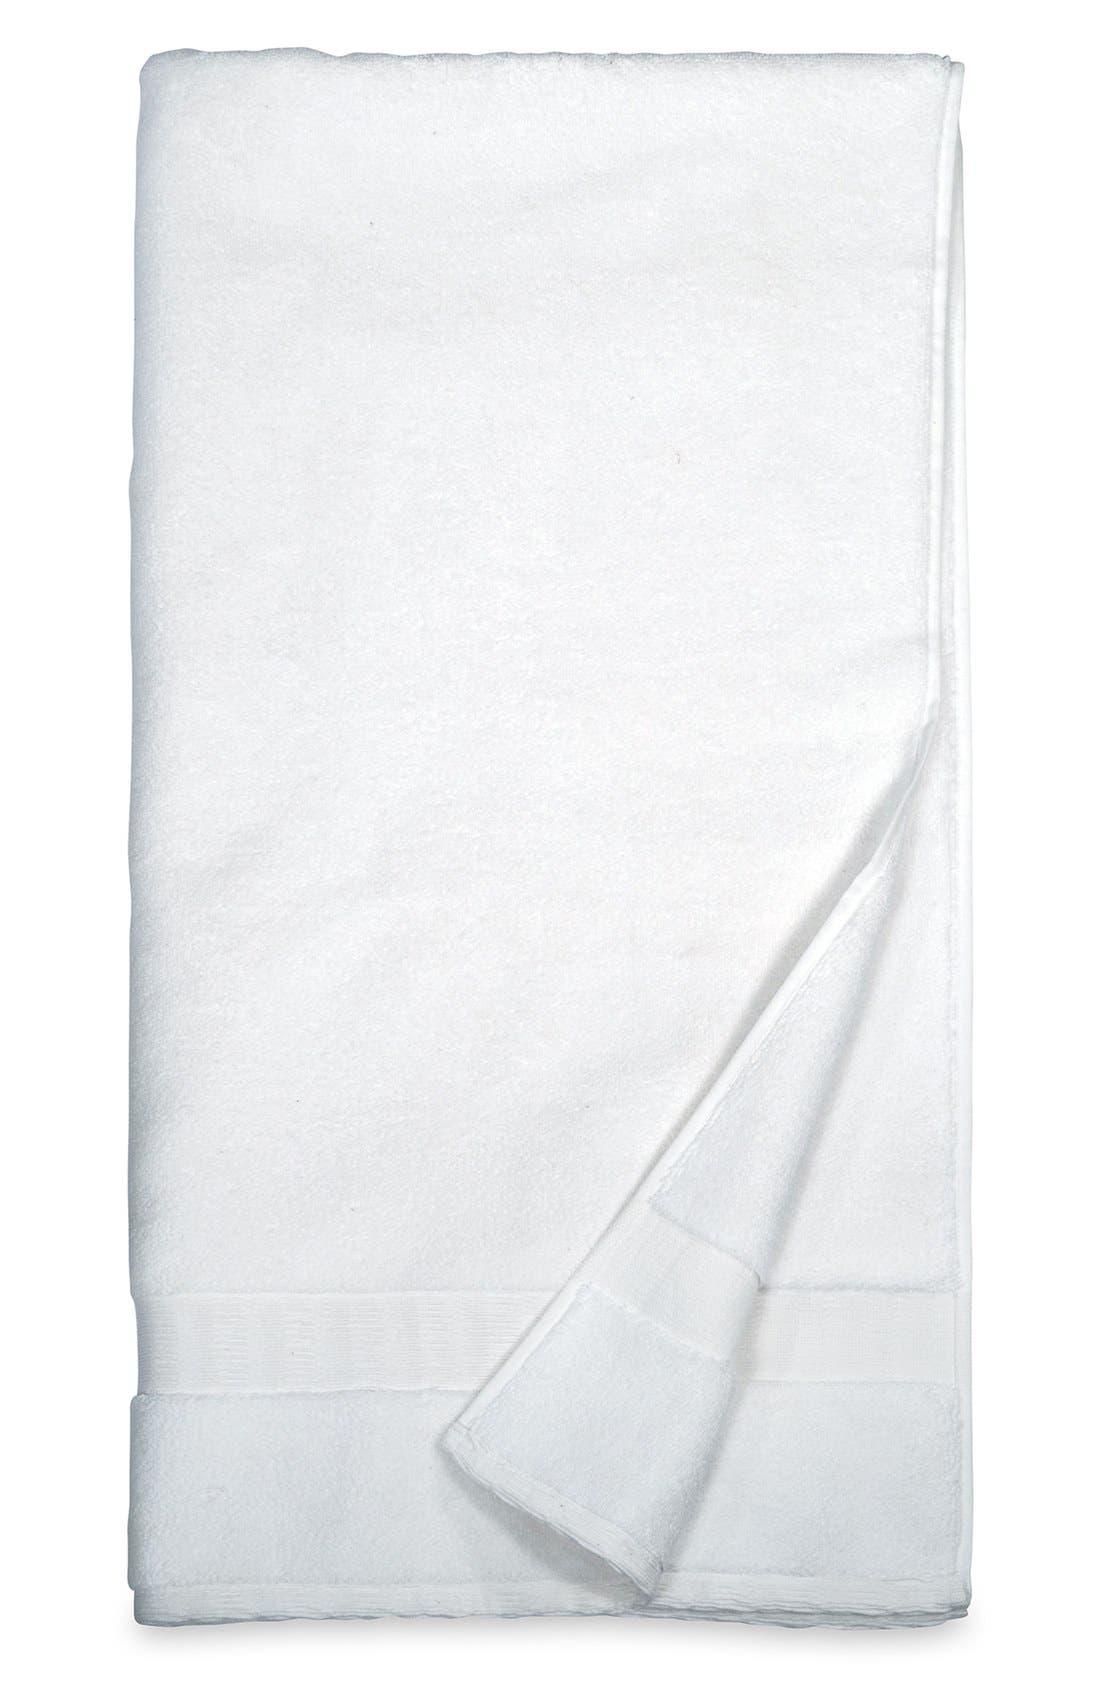 DKNY Mercer Bath Sheet, Main, color, WHITE